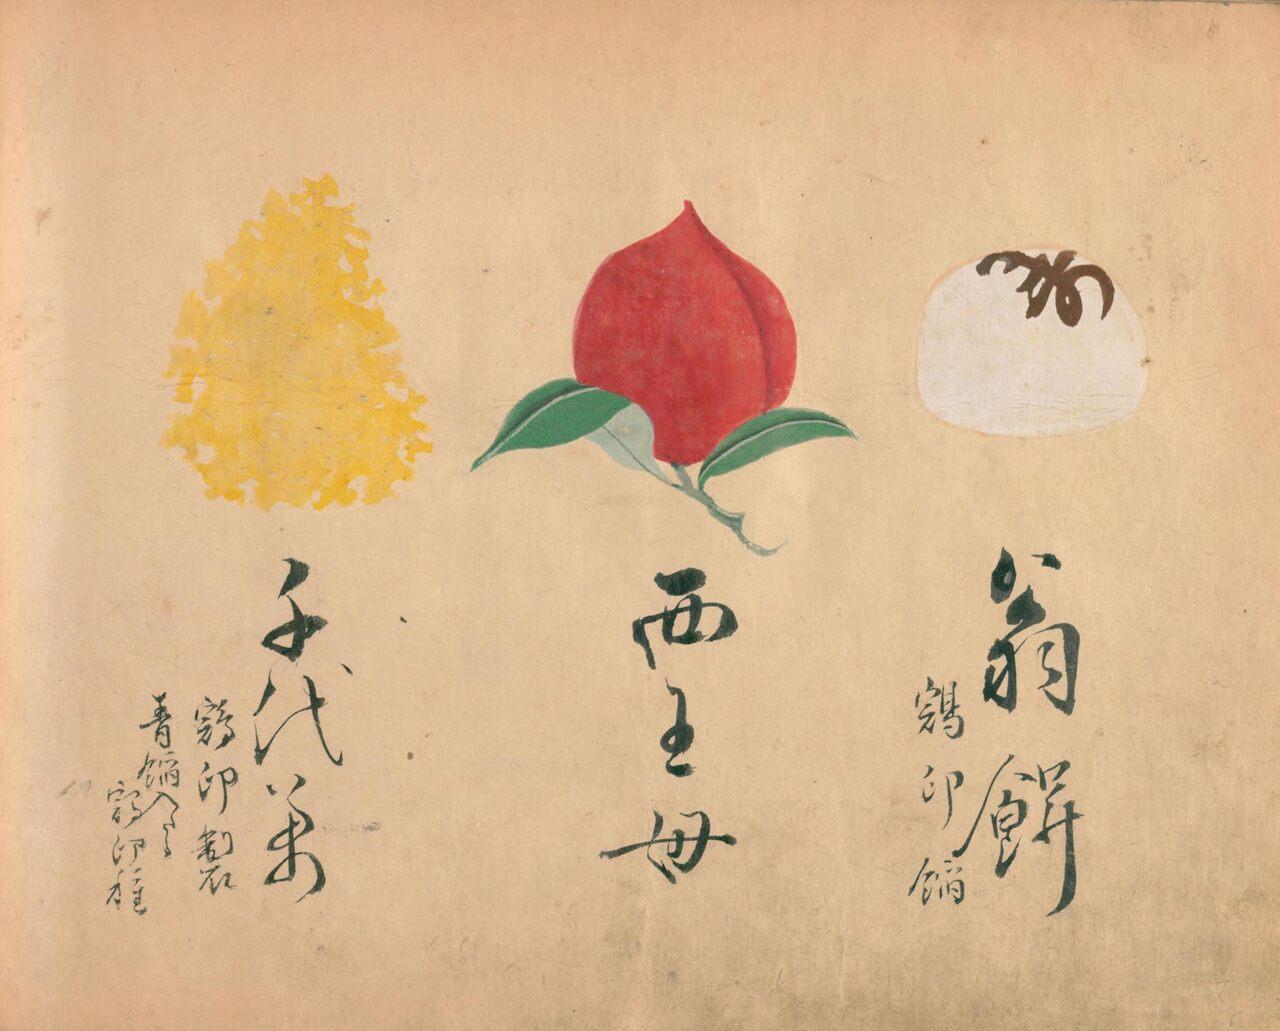 A red peach-shaped <em>wagashi</em> dominates this page.